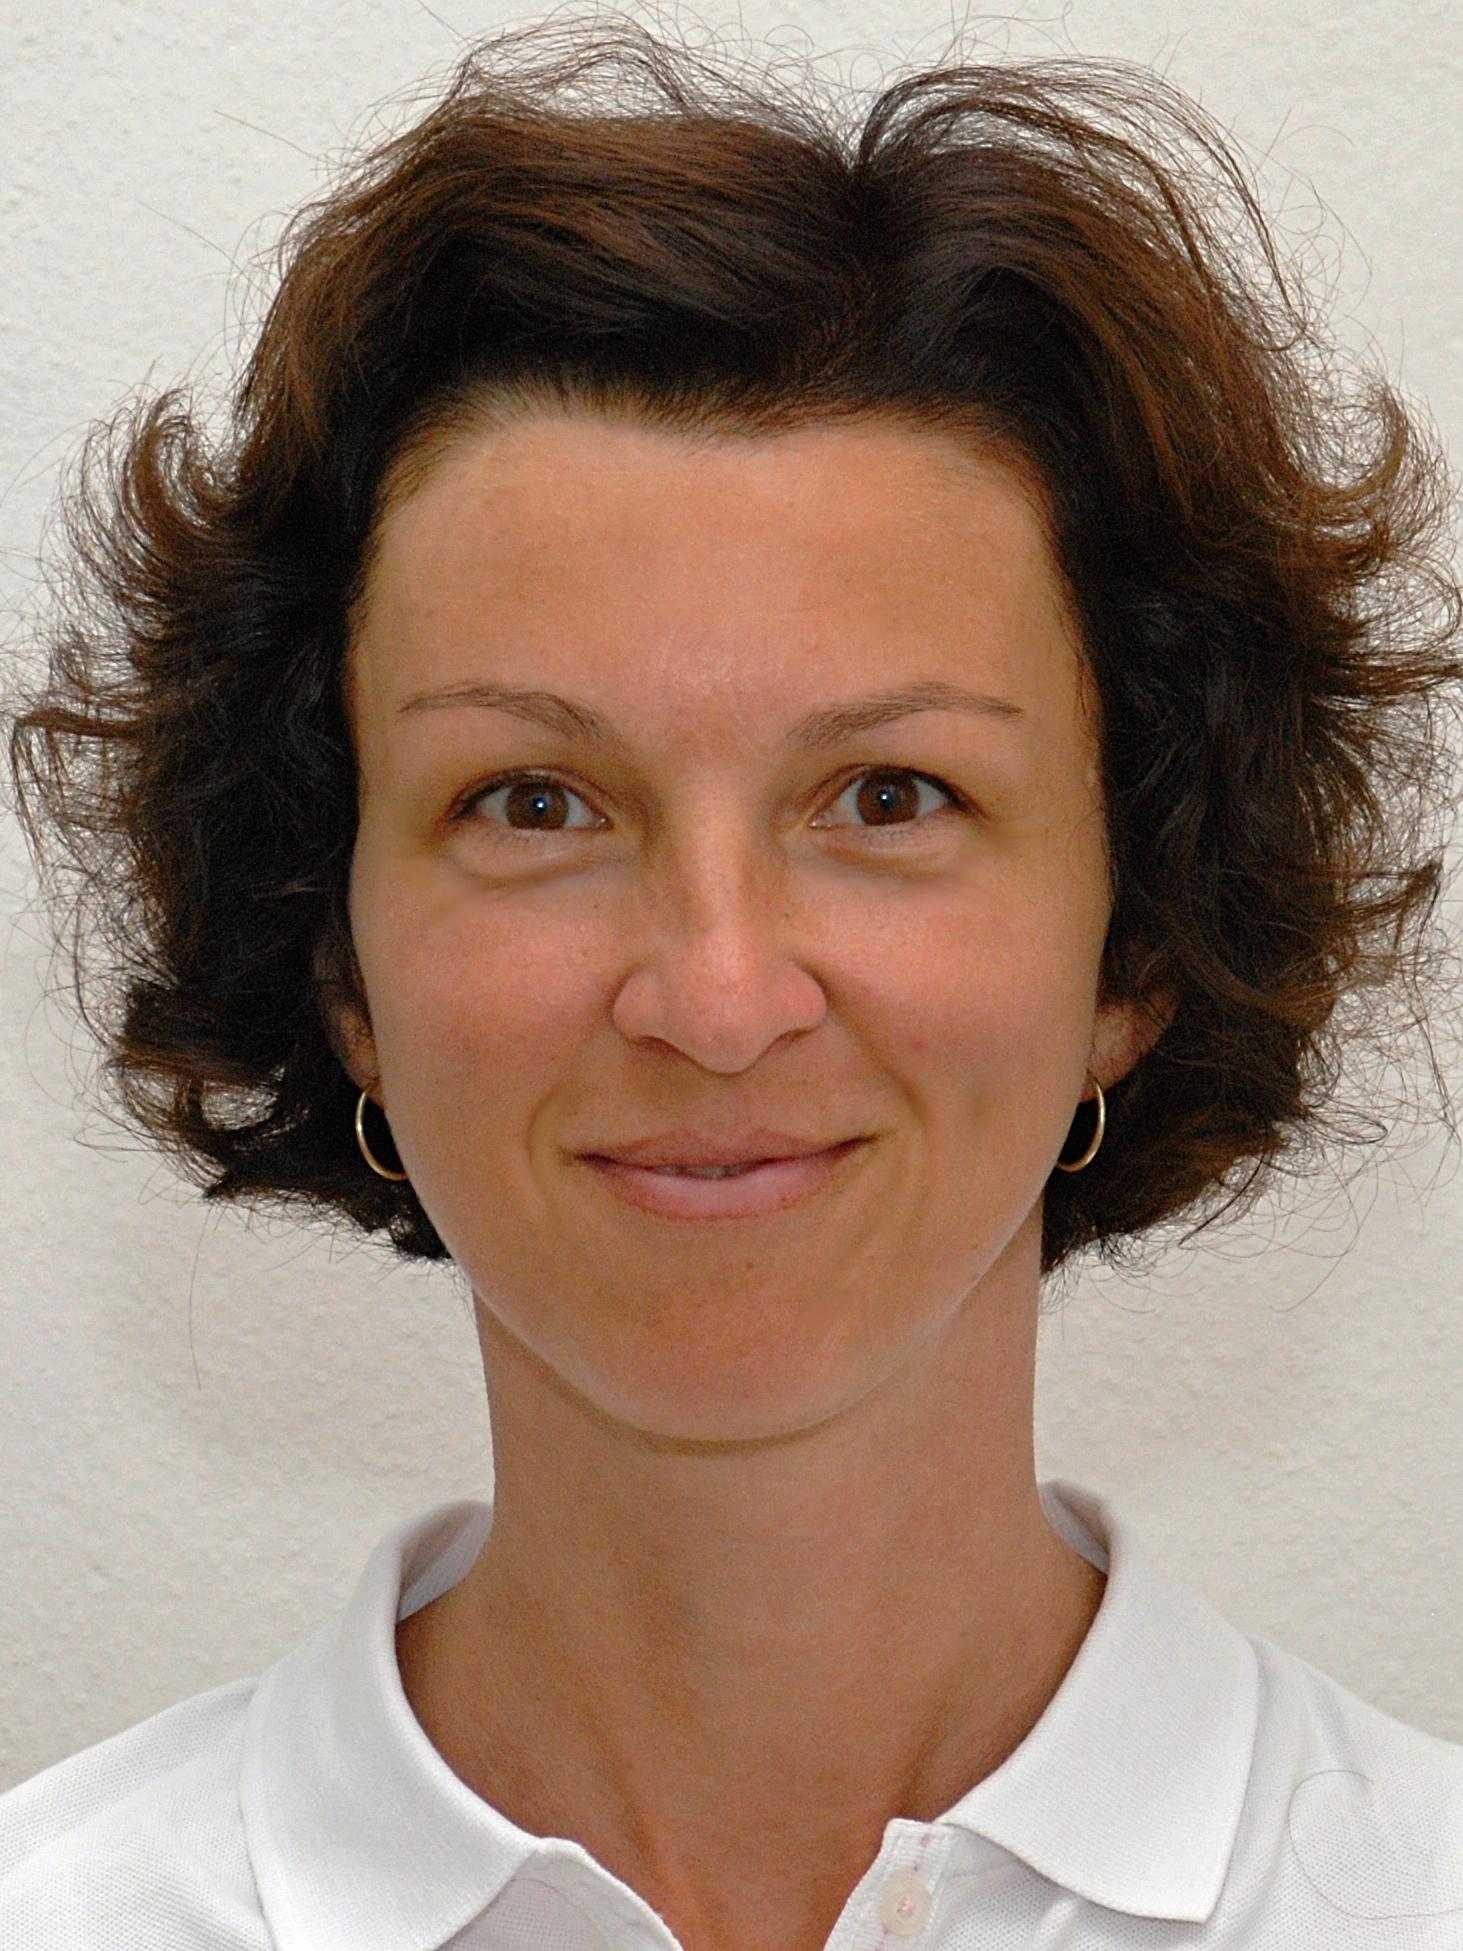 Bc. Lenka Baďurová